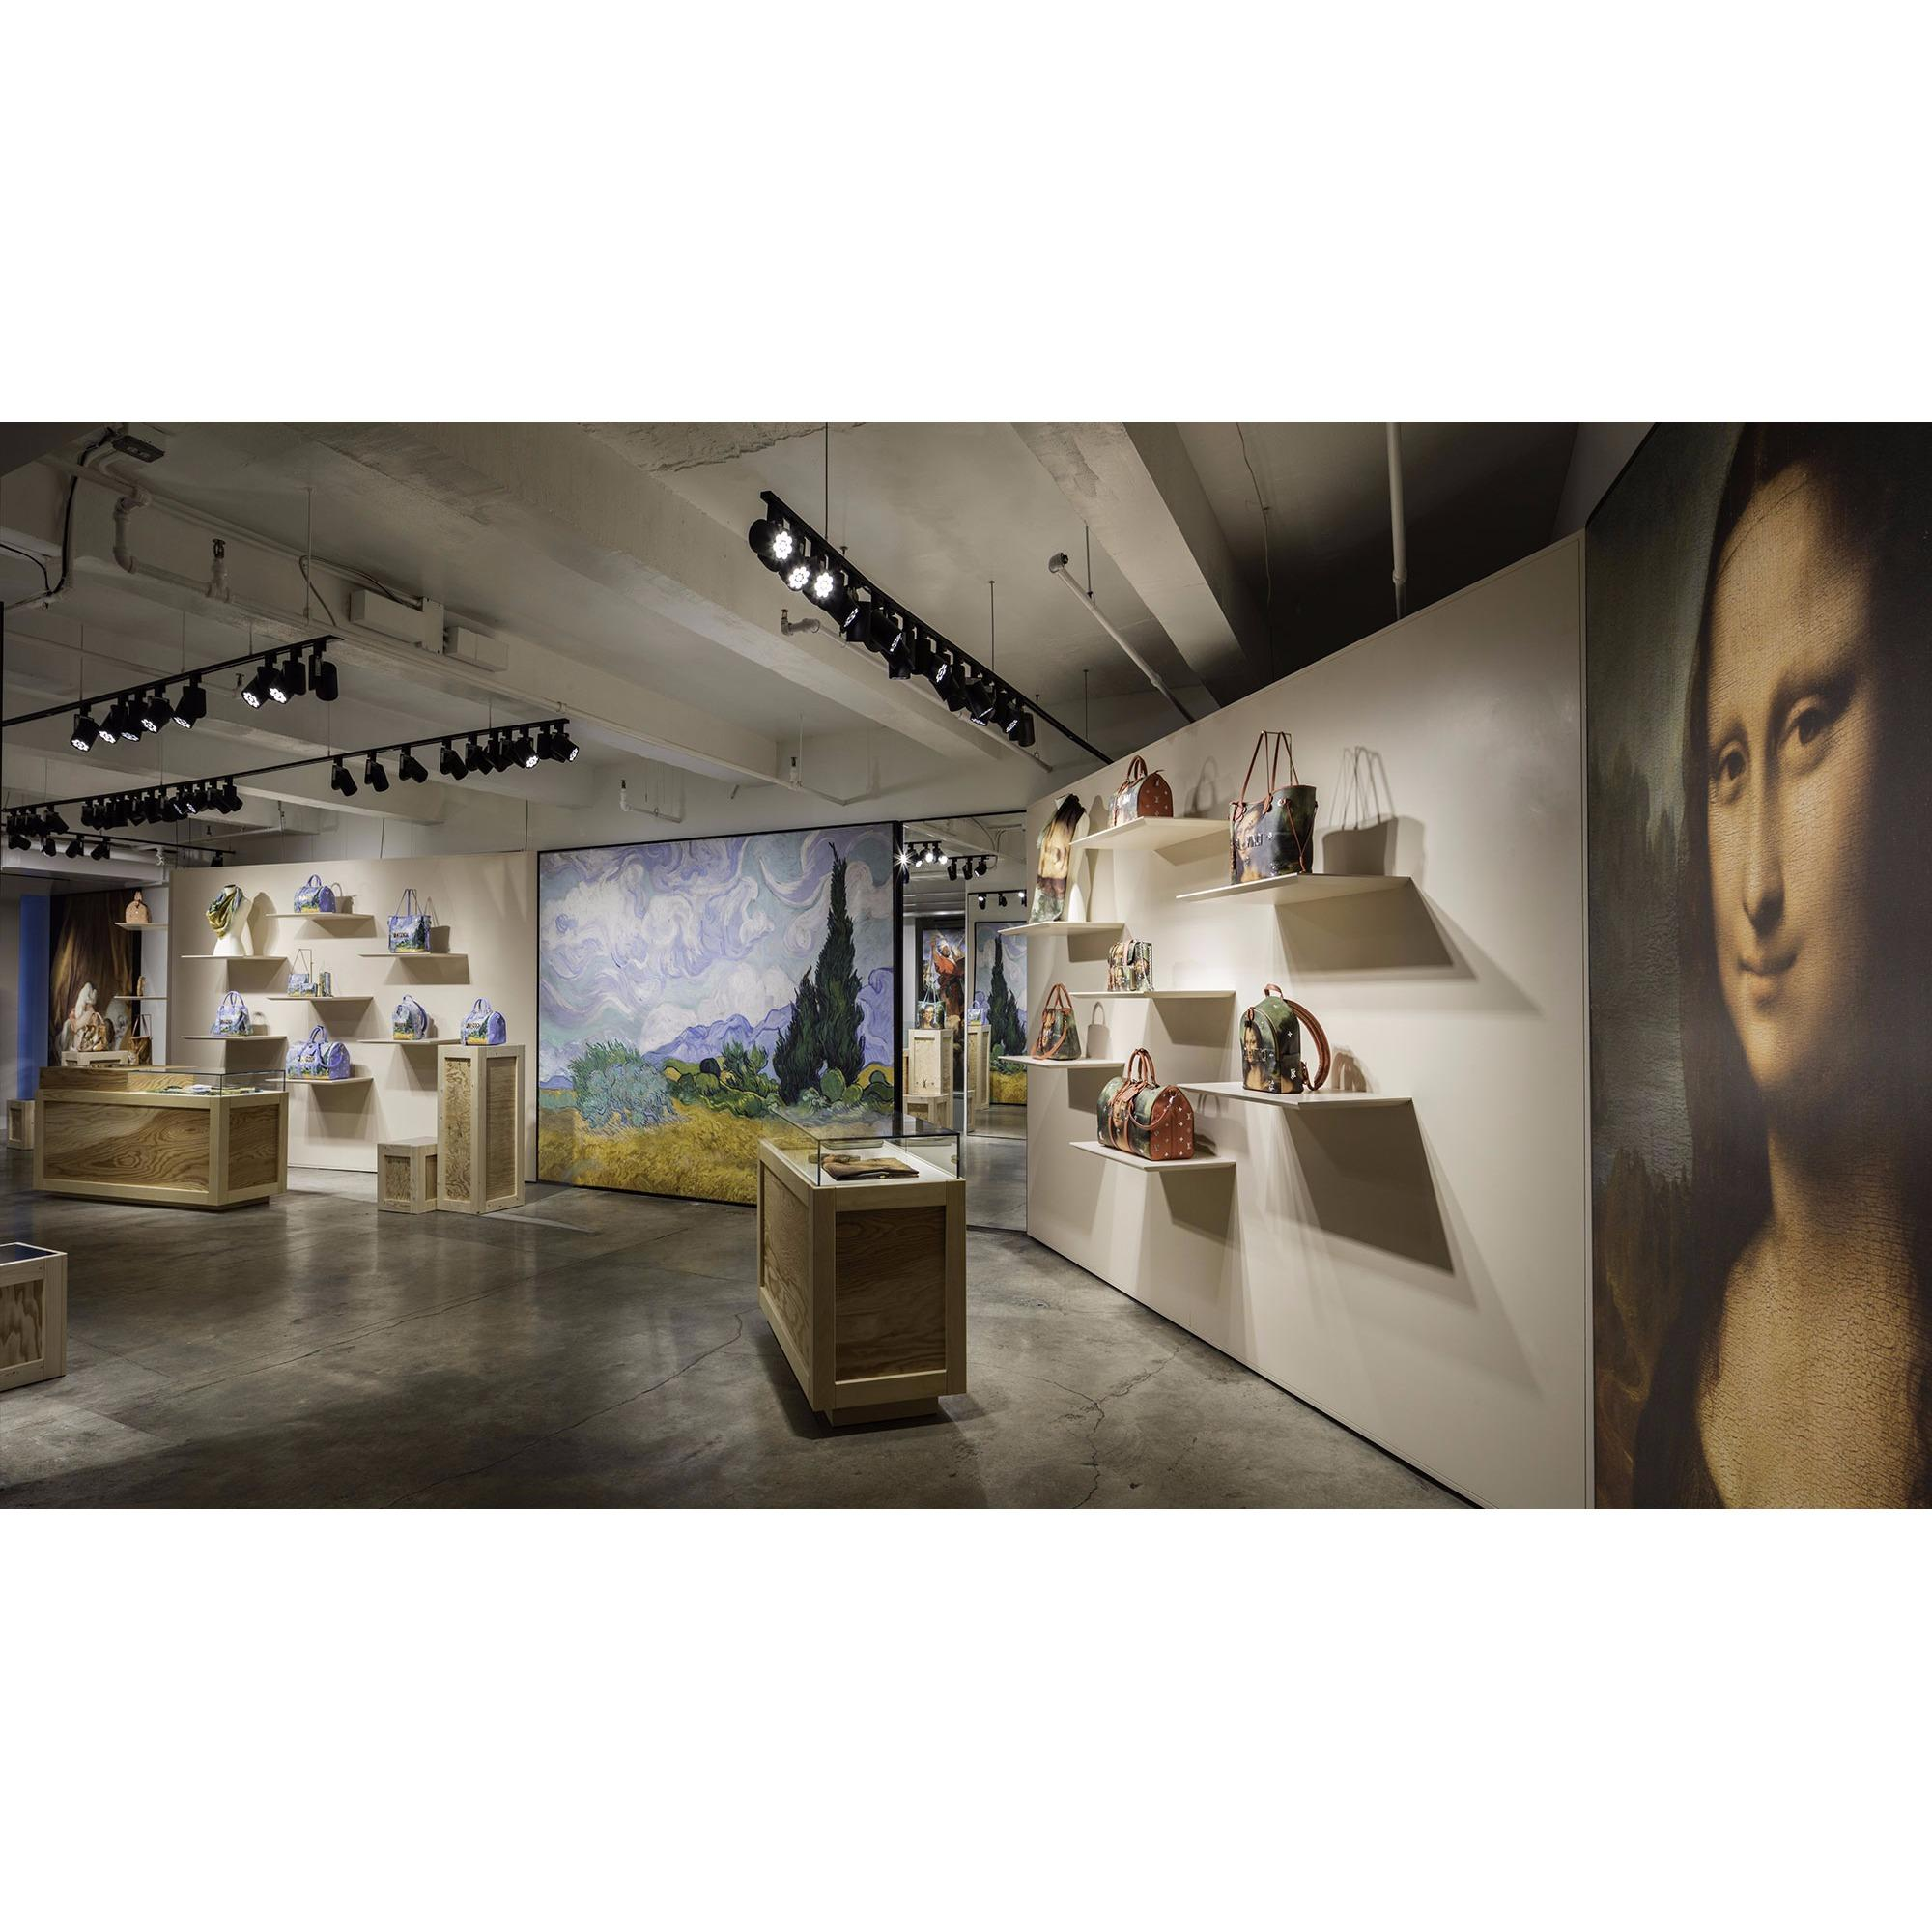 Louis Vuitton New York Madison Avenue - Closed